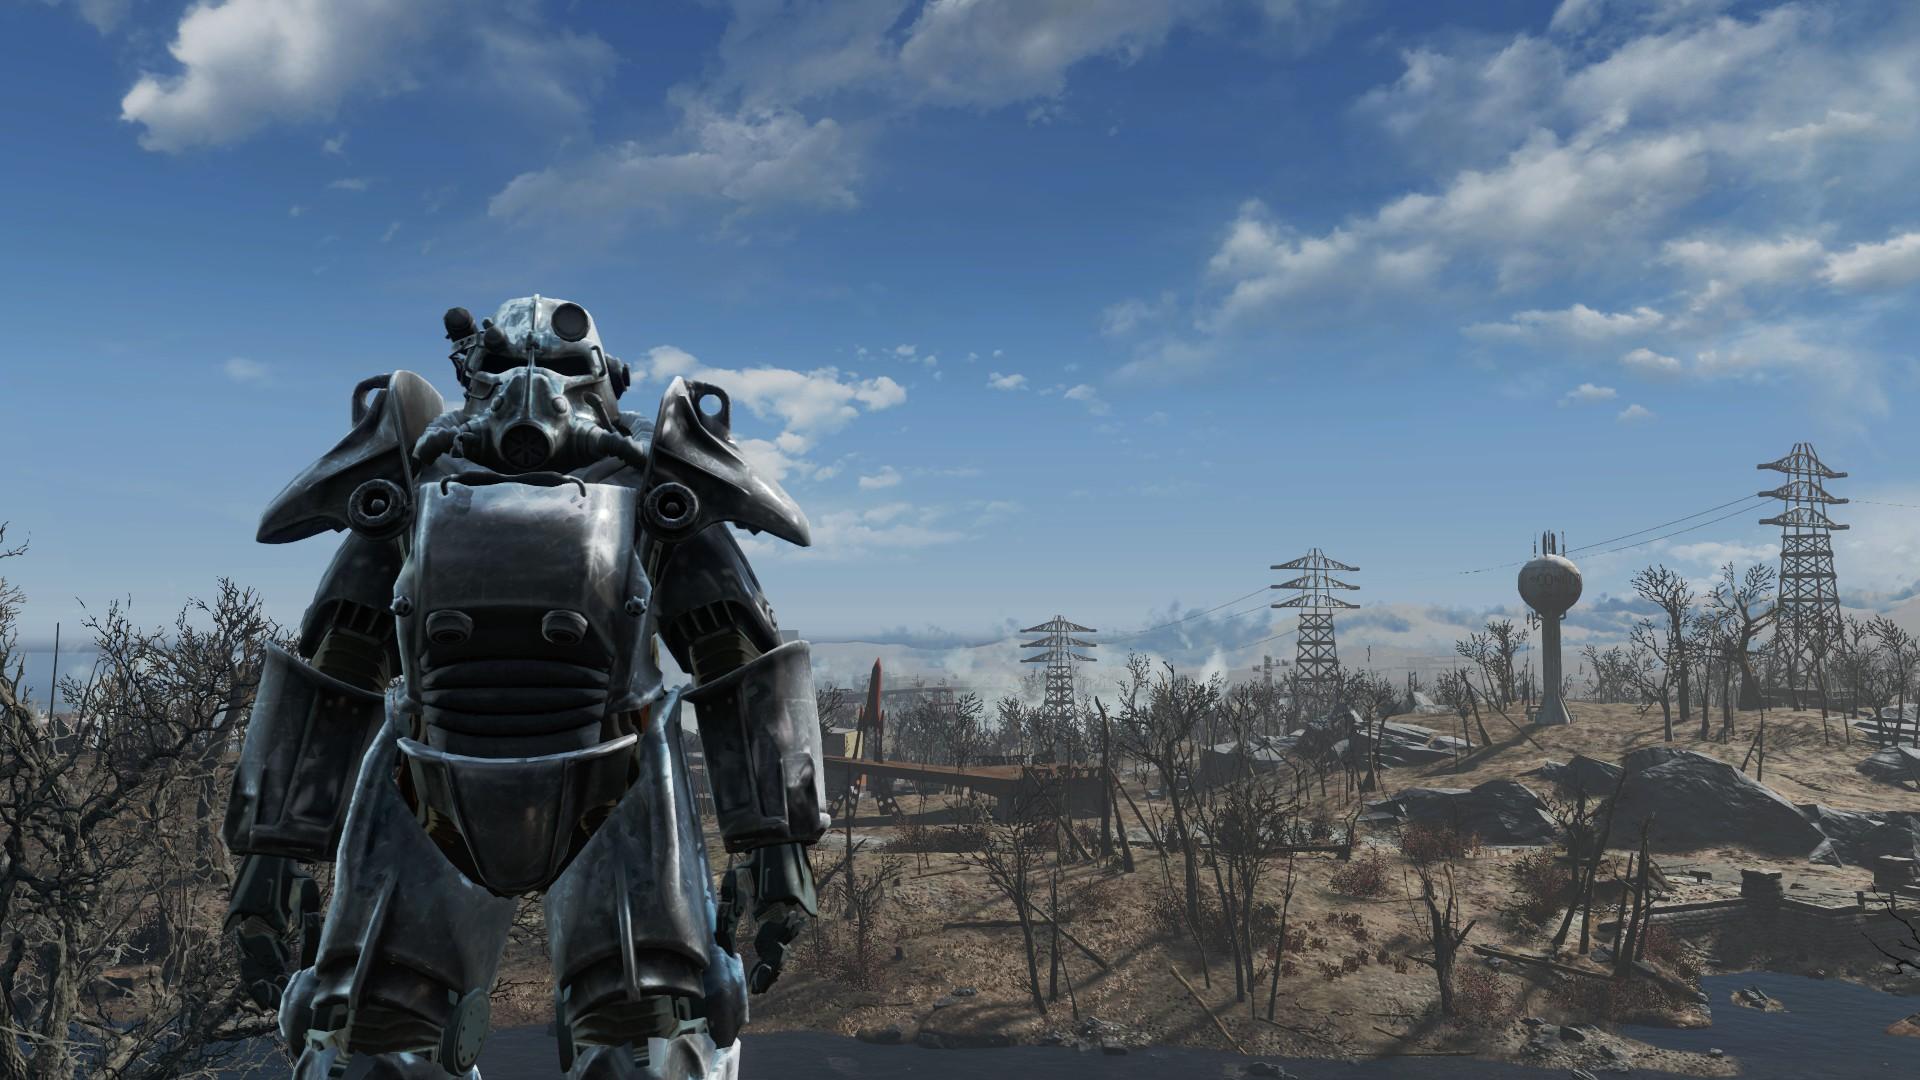 20190406171201_1.jpg - Fallout 4